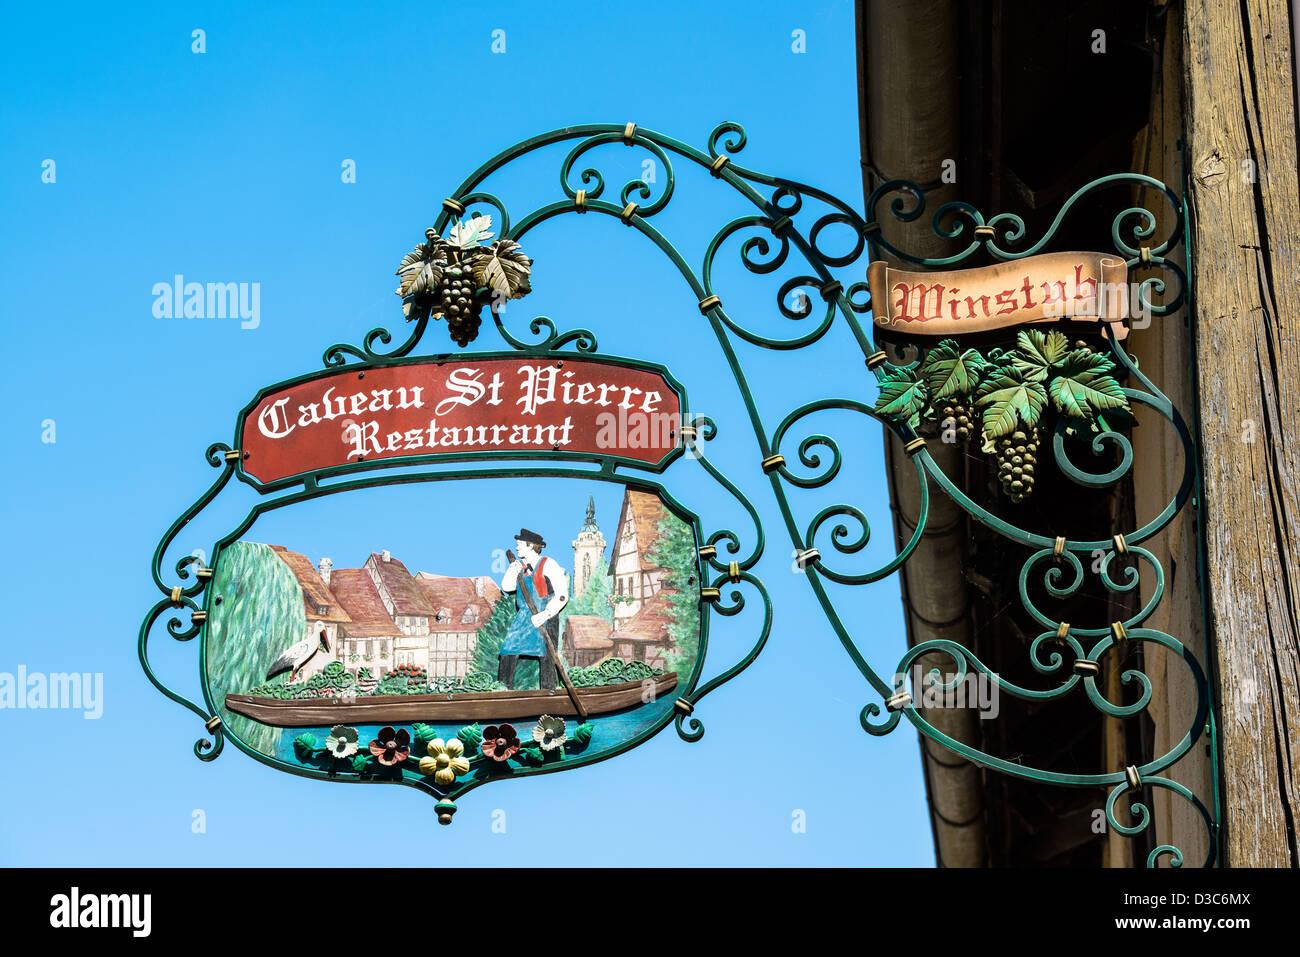 Inn sign of Winstub Cabeau St Pierre in Colmar, France - Stock Image